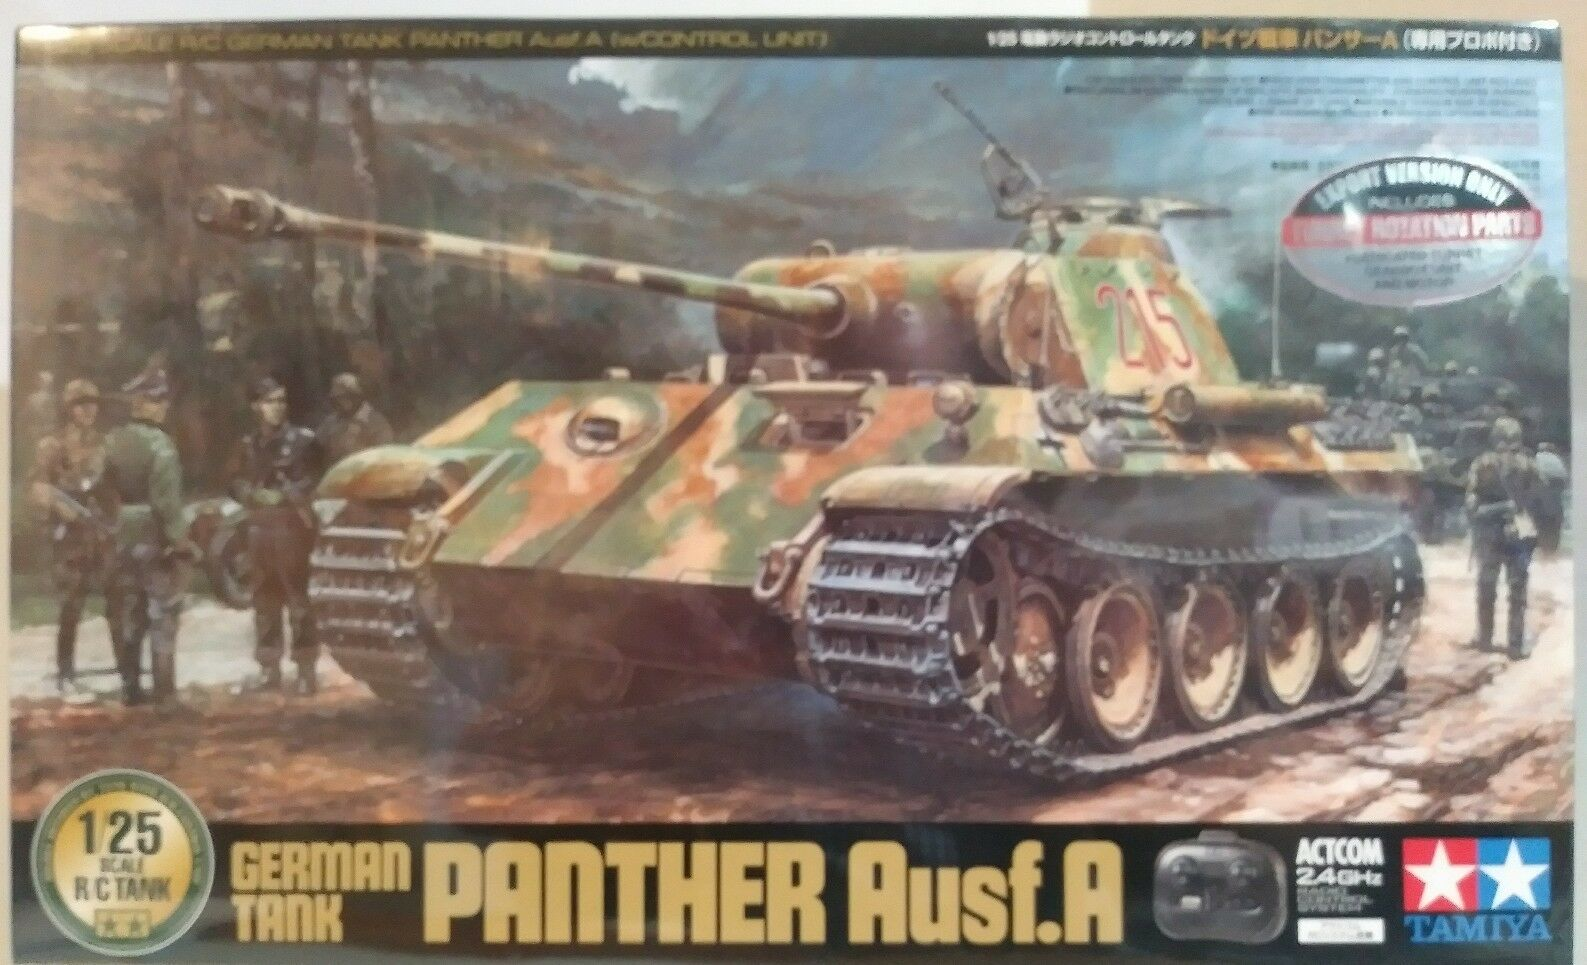 Tamiya 1 25 scale R C  kit  56605, Geruomo Panther, Ausf.A.  vendendo bene in tutto il mondo